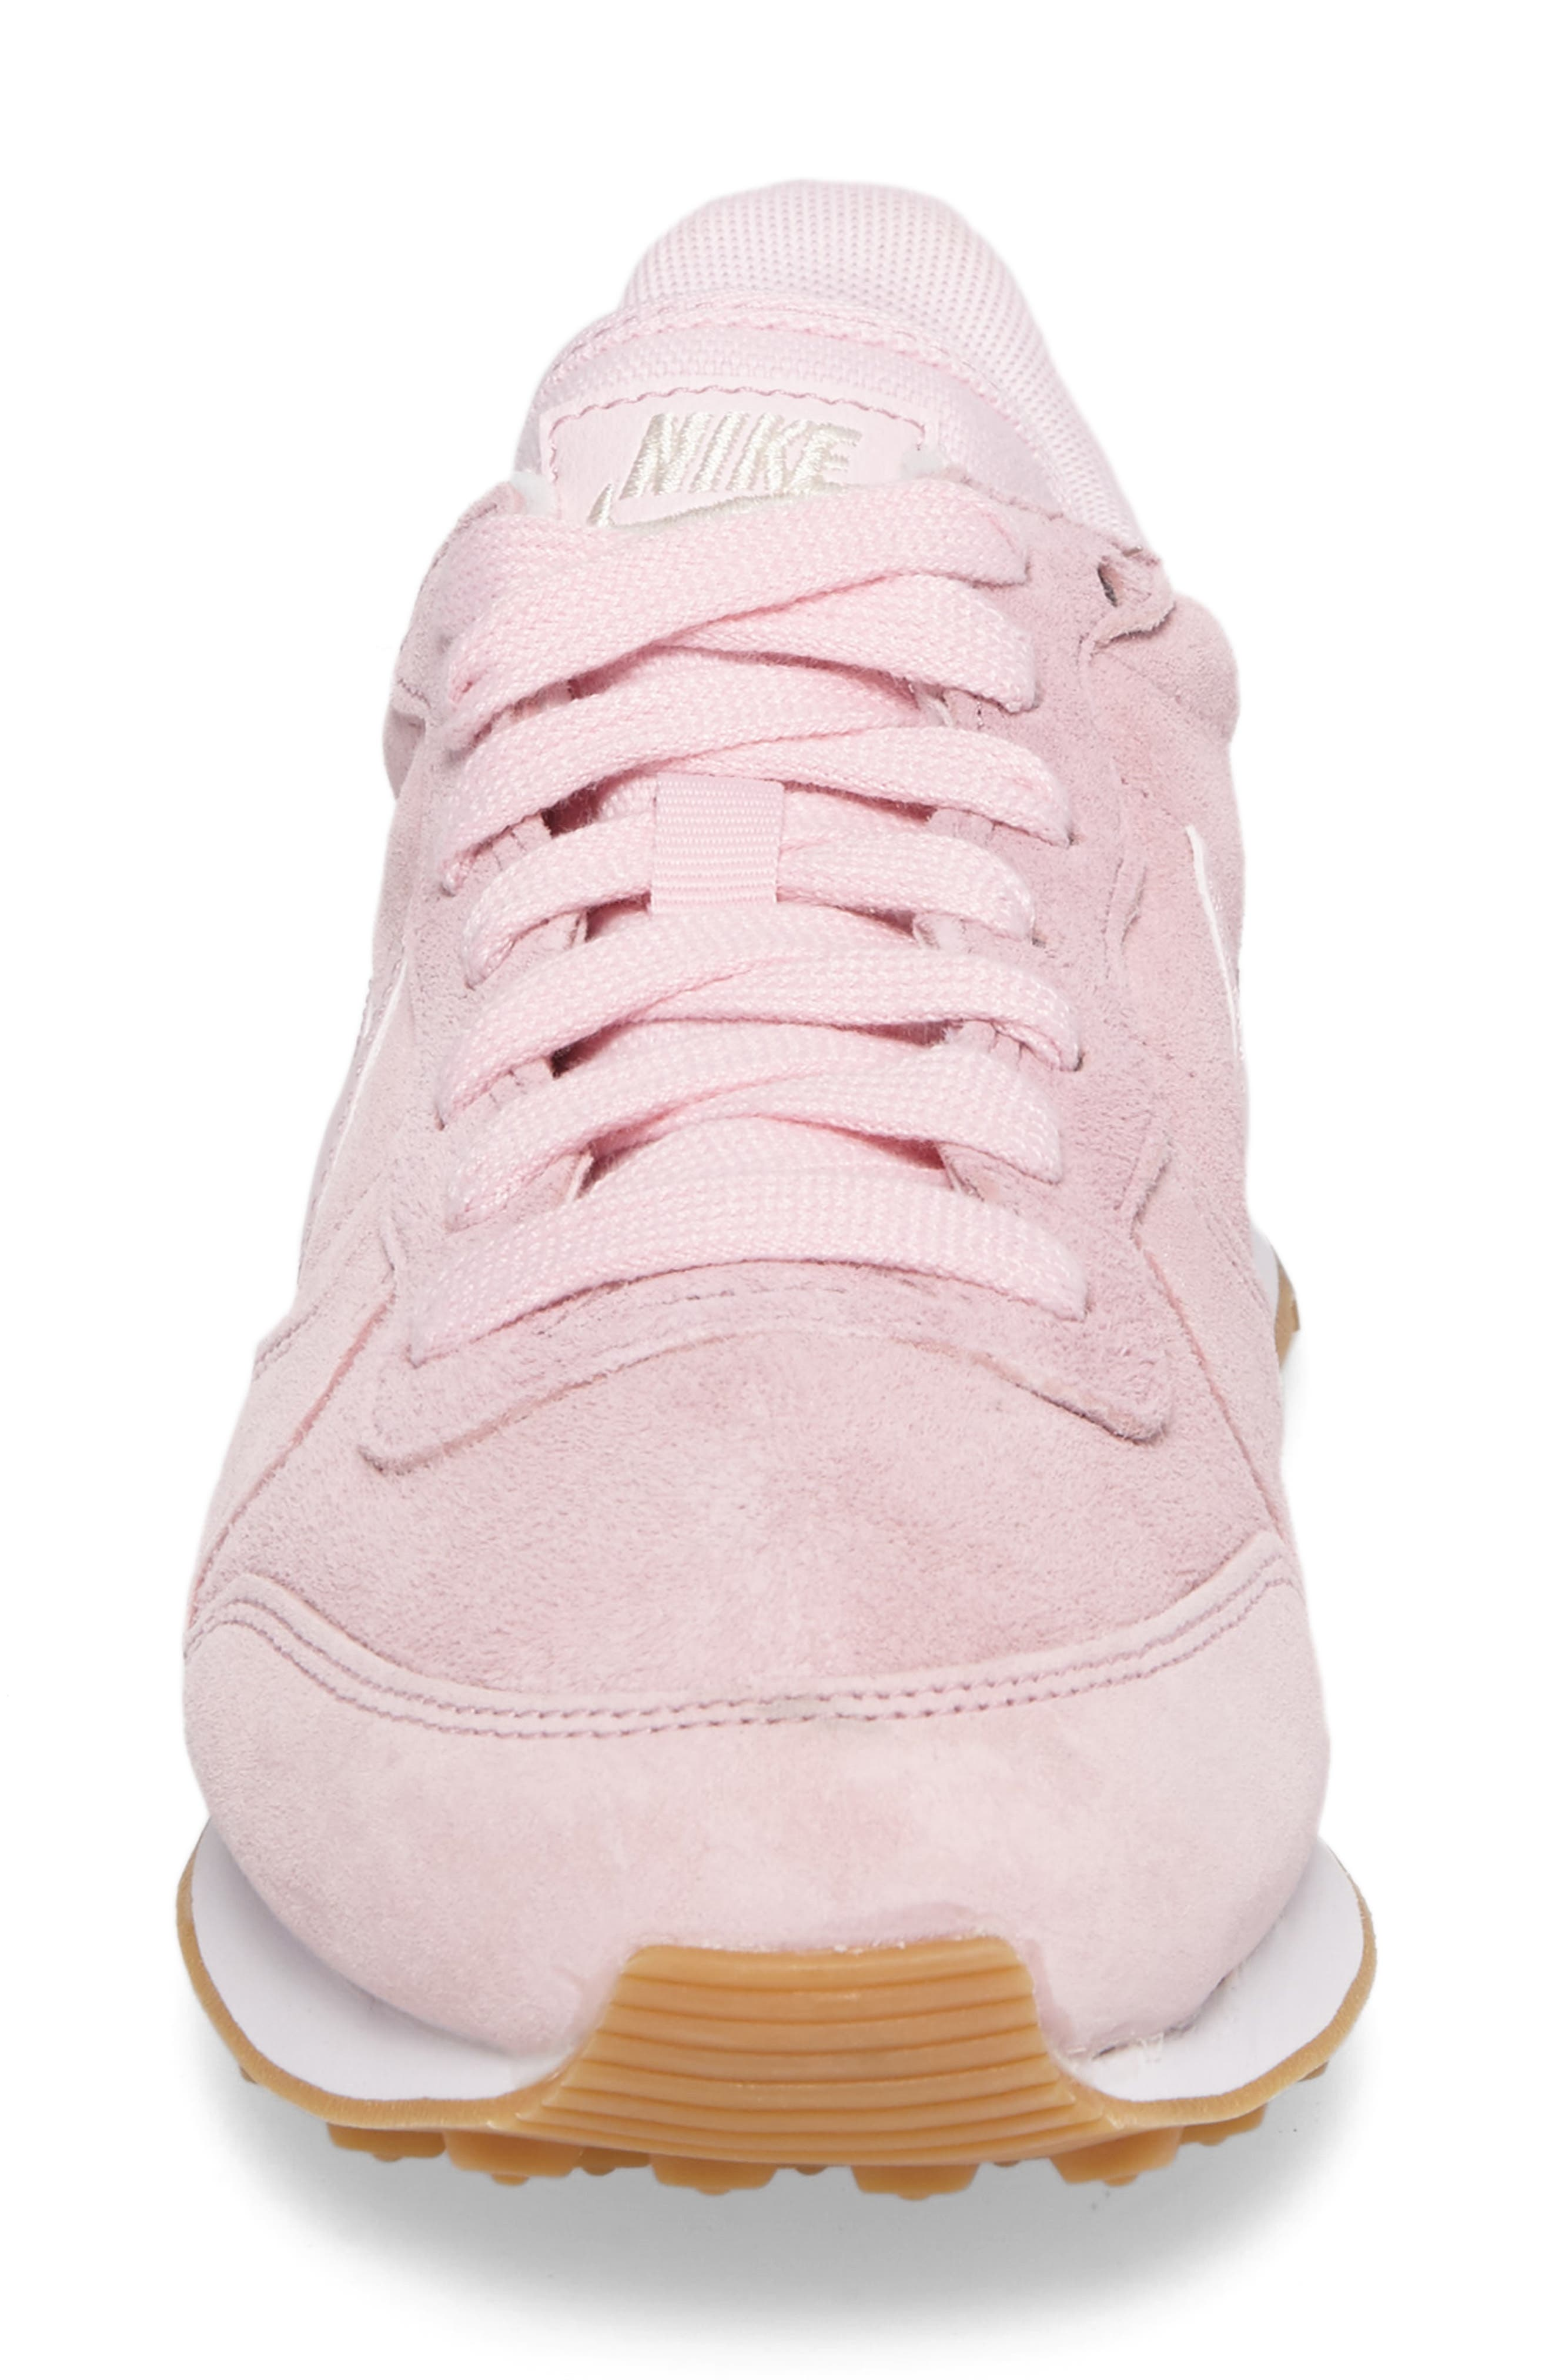 Internationalist SD Sneaker,                             Alternate thumbnail 4, color,                             Prism Pink/ Prism Pink